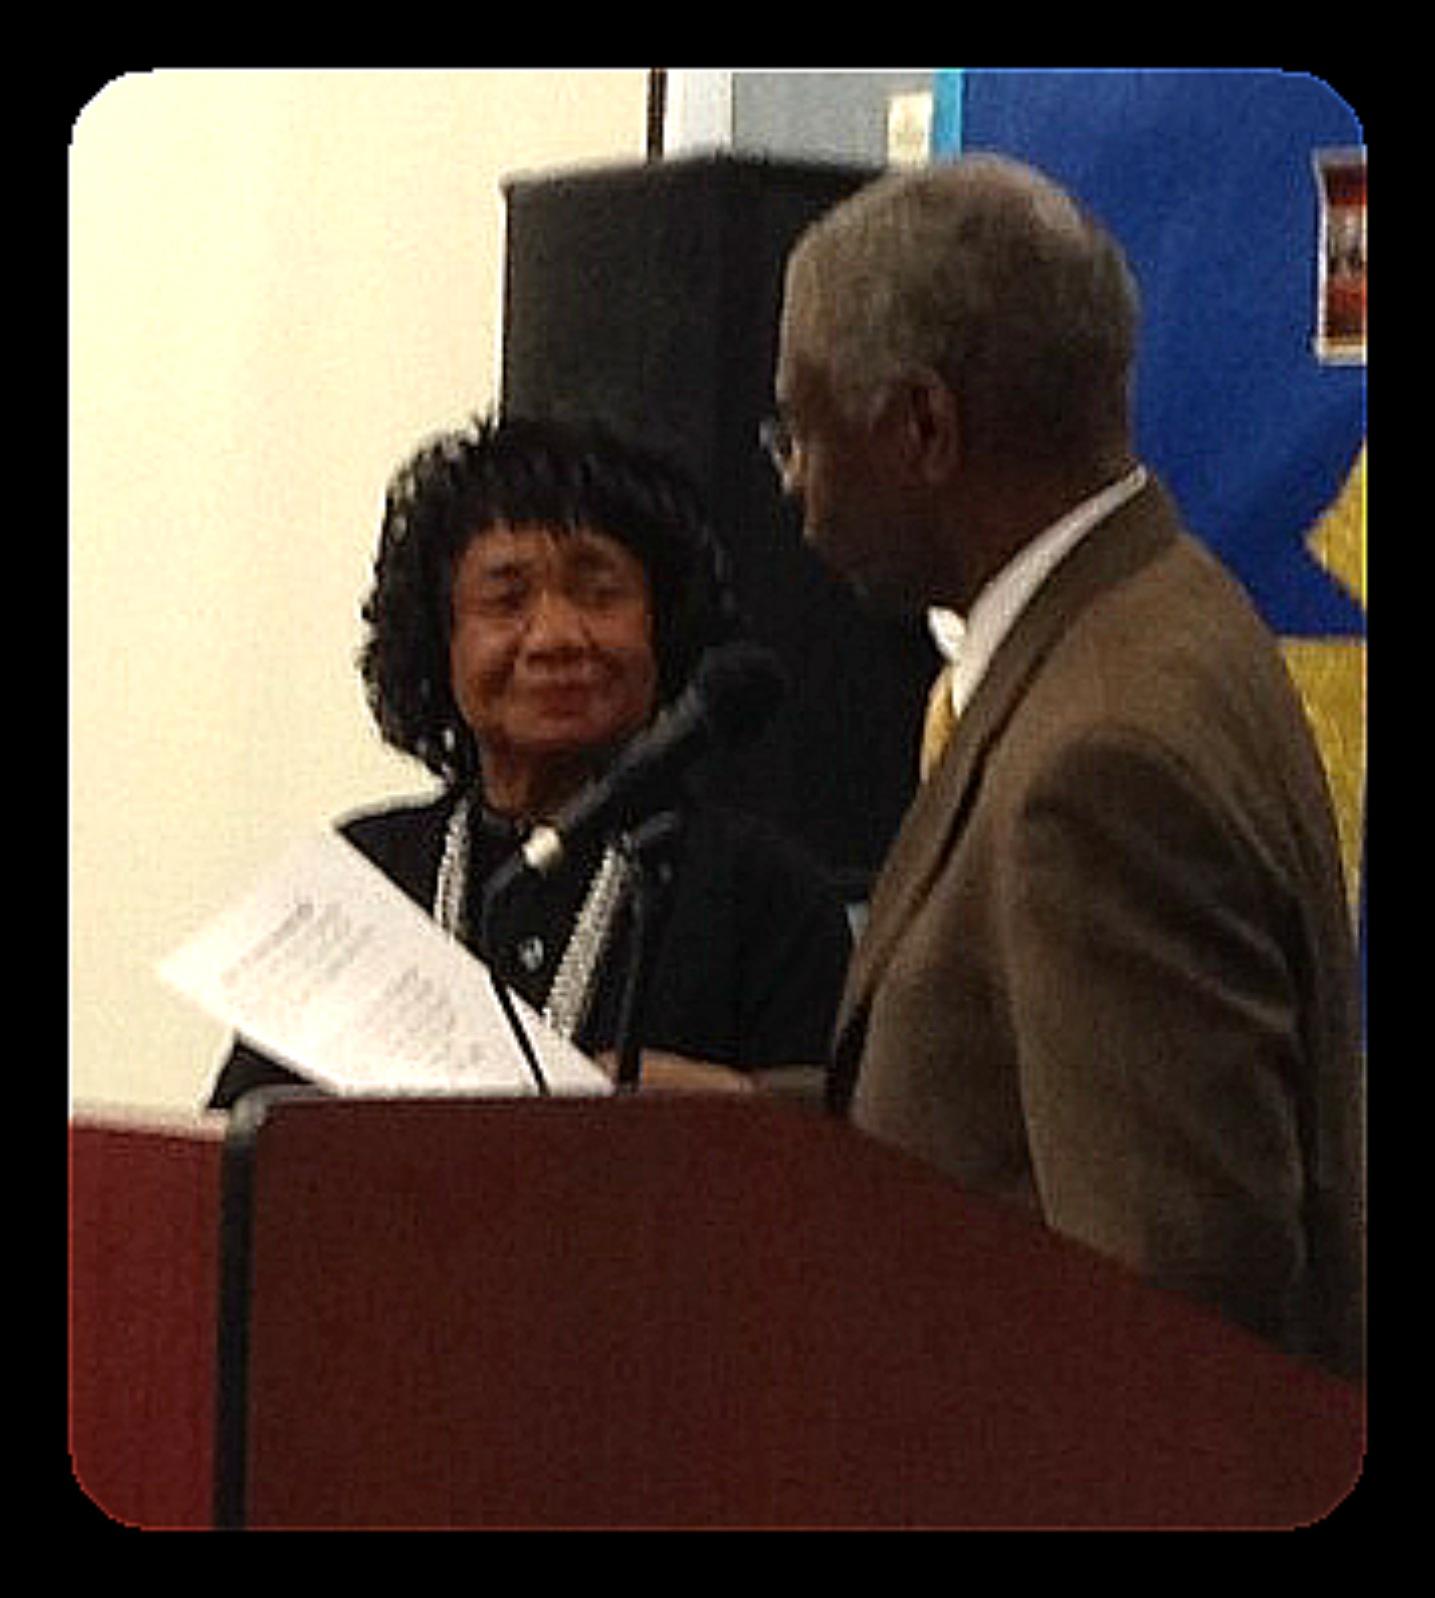 Center-for-Healing-Racism-_Cherry-Steinwender-receives-2013-Ghandhi-King-Ikeda-Award3